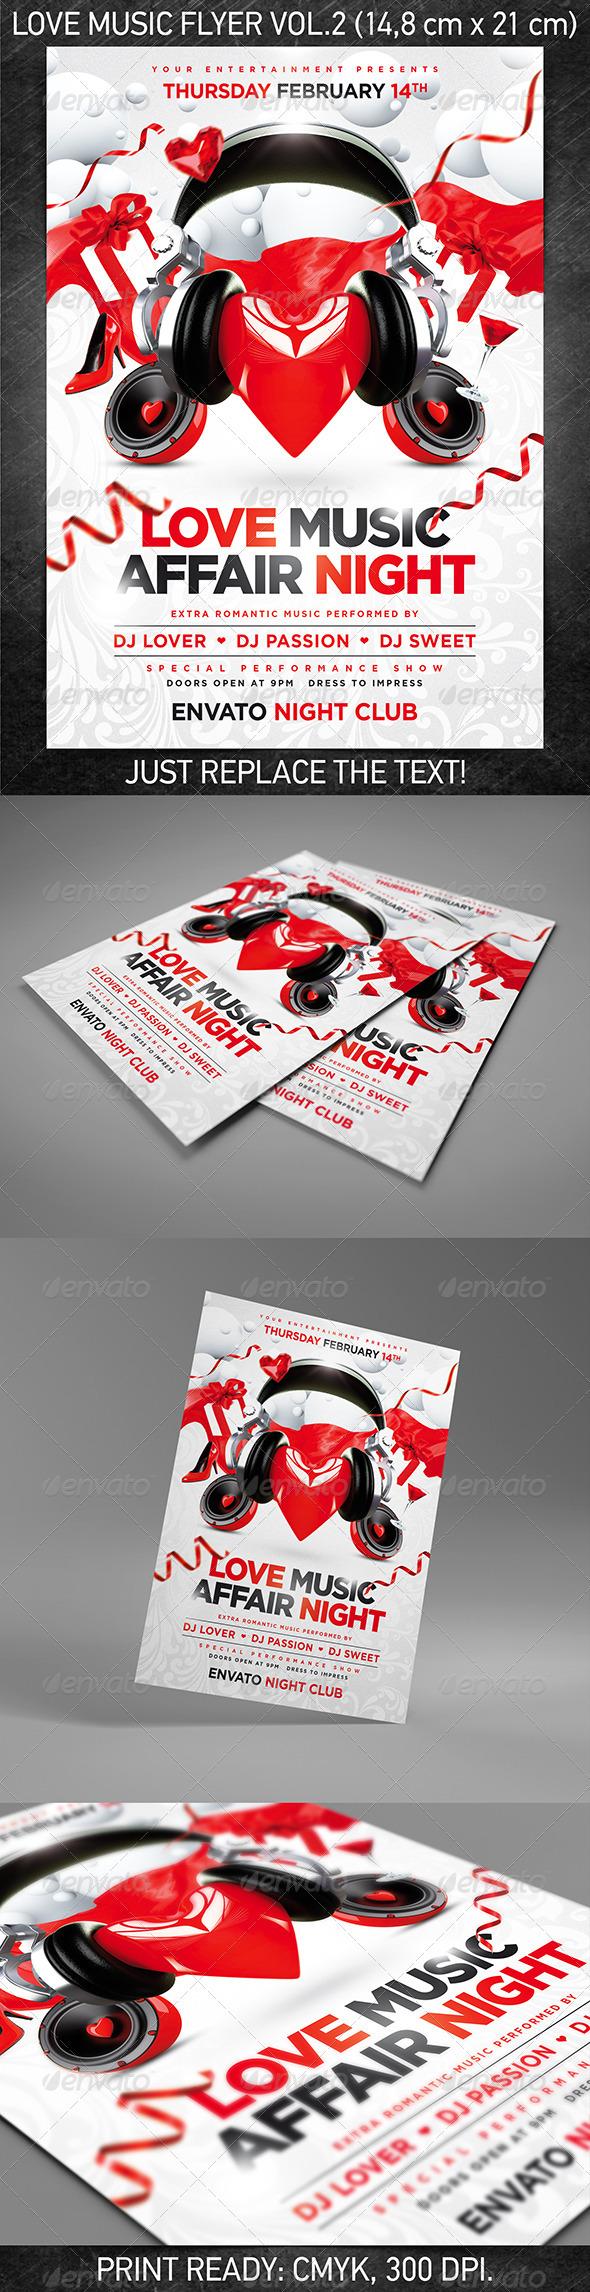 GraphicRiver Love music flyer vol.2 3789519